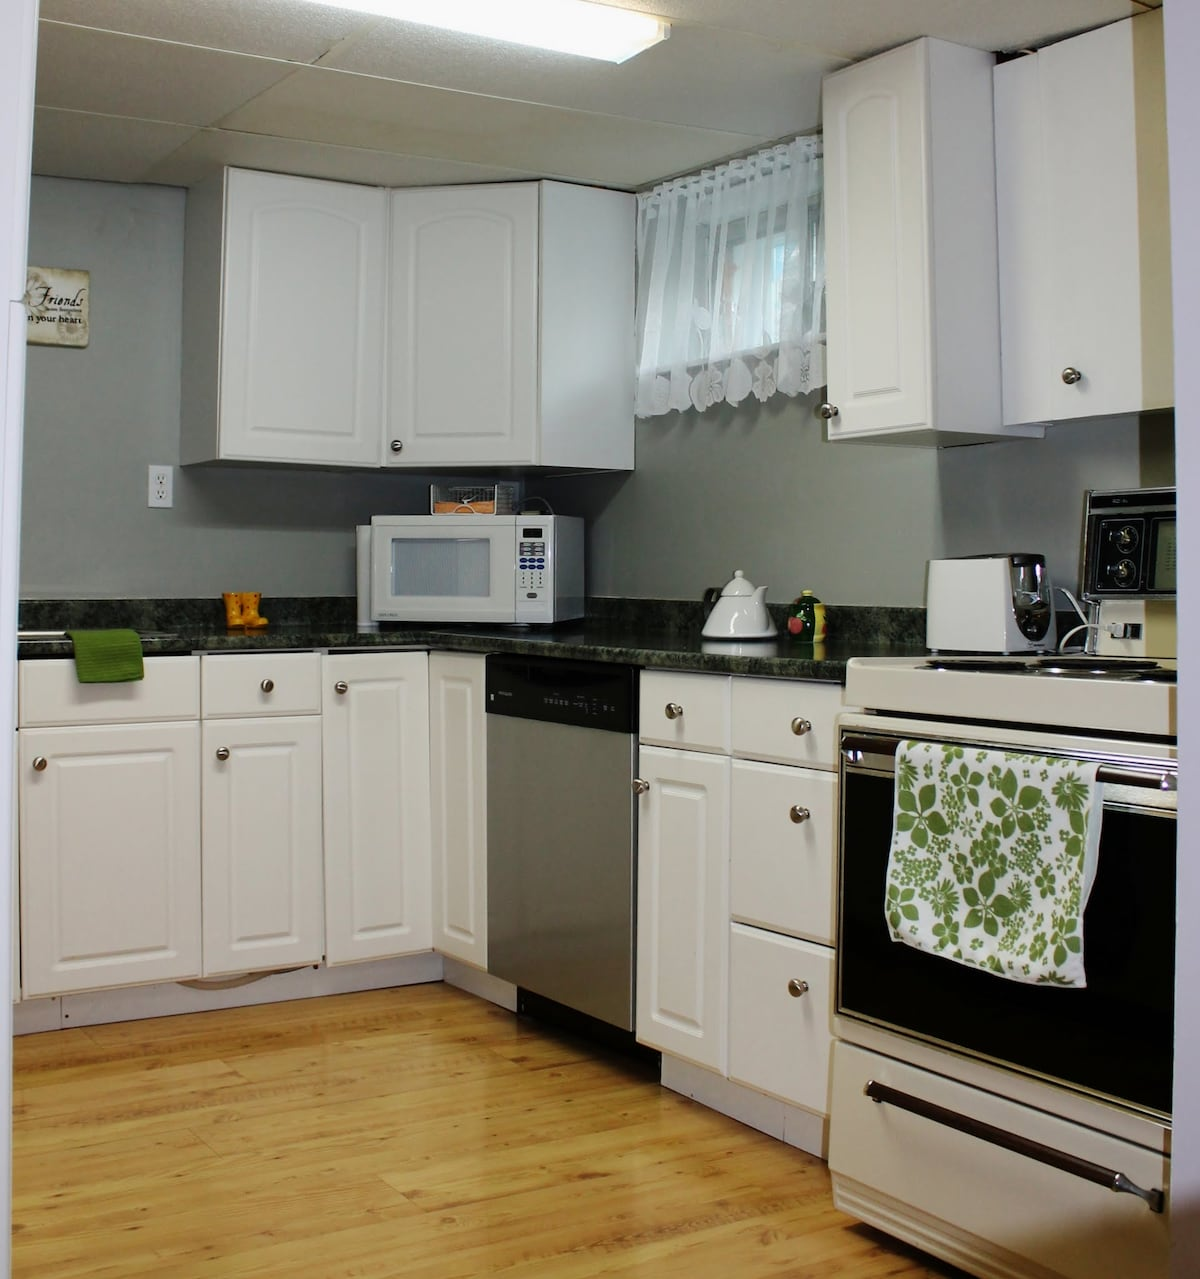 Large U shaped bright Kitchen -  2 windows